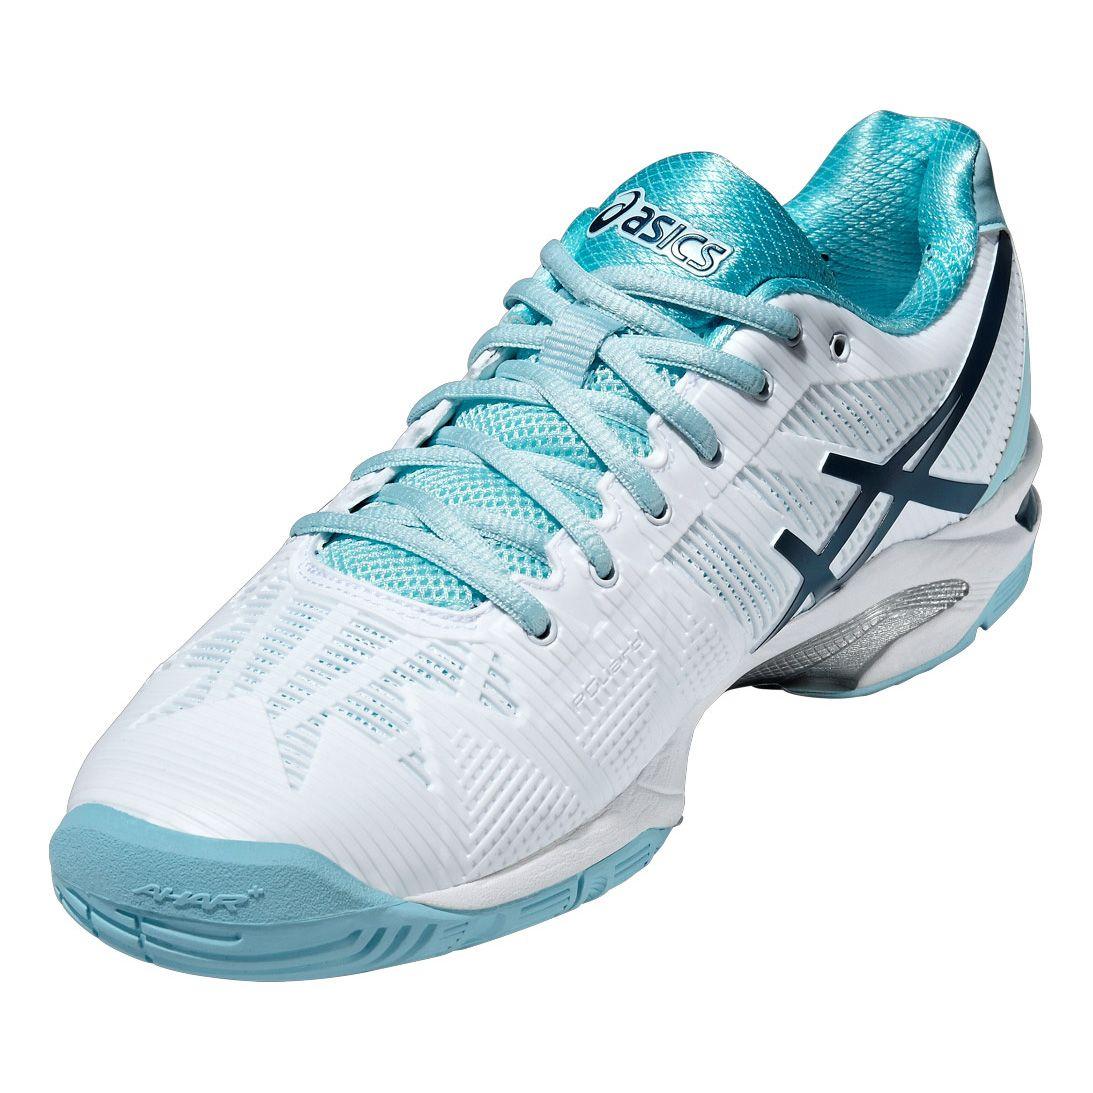 asics gel solution speed 3 ladies tennis shoes. Black Bedroom Furniture Sets. Home Design Ideas